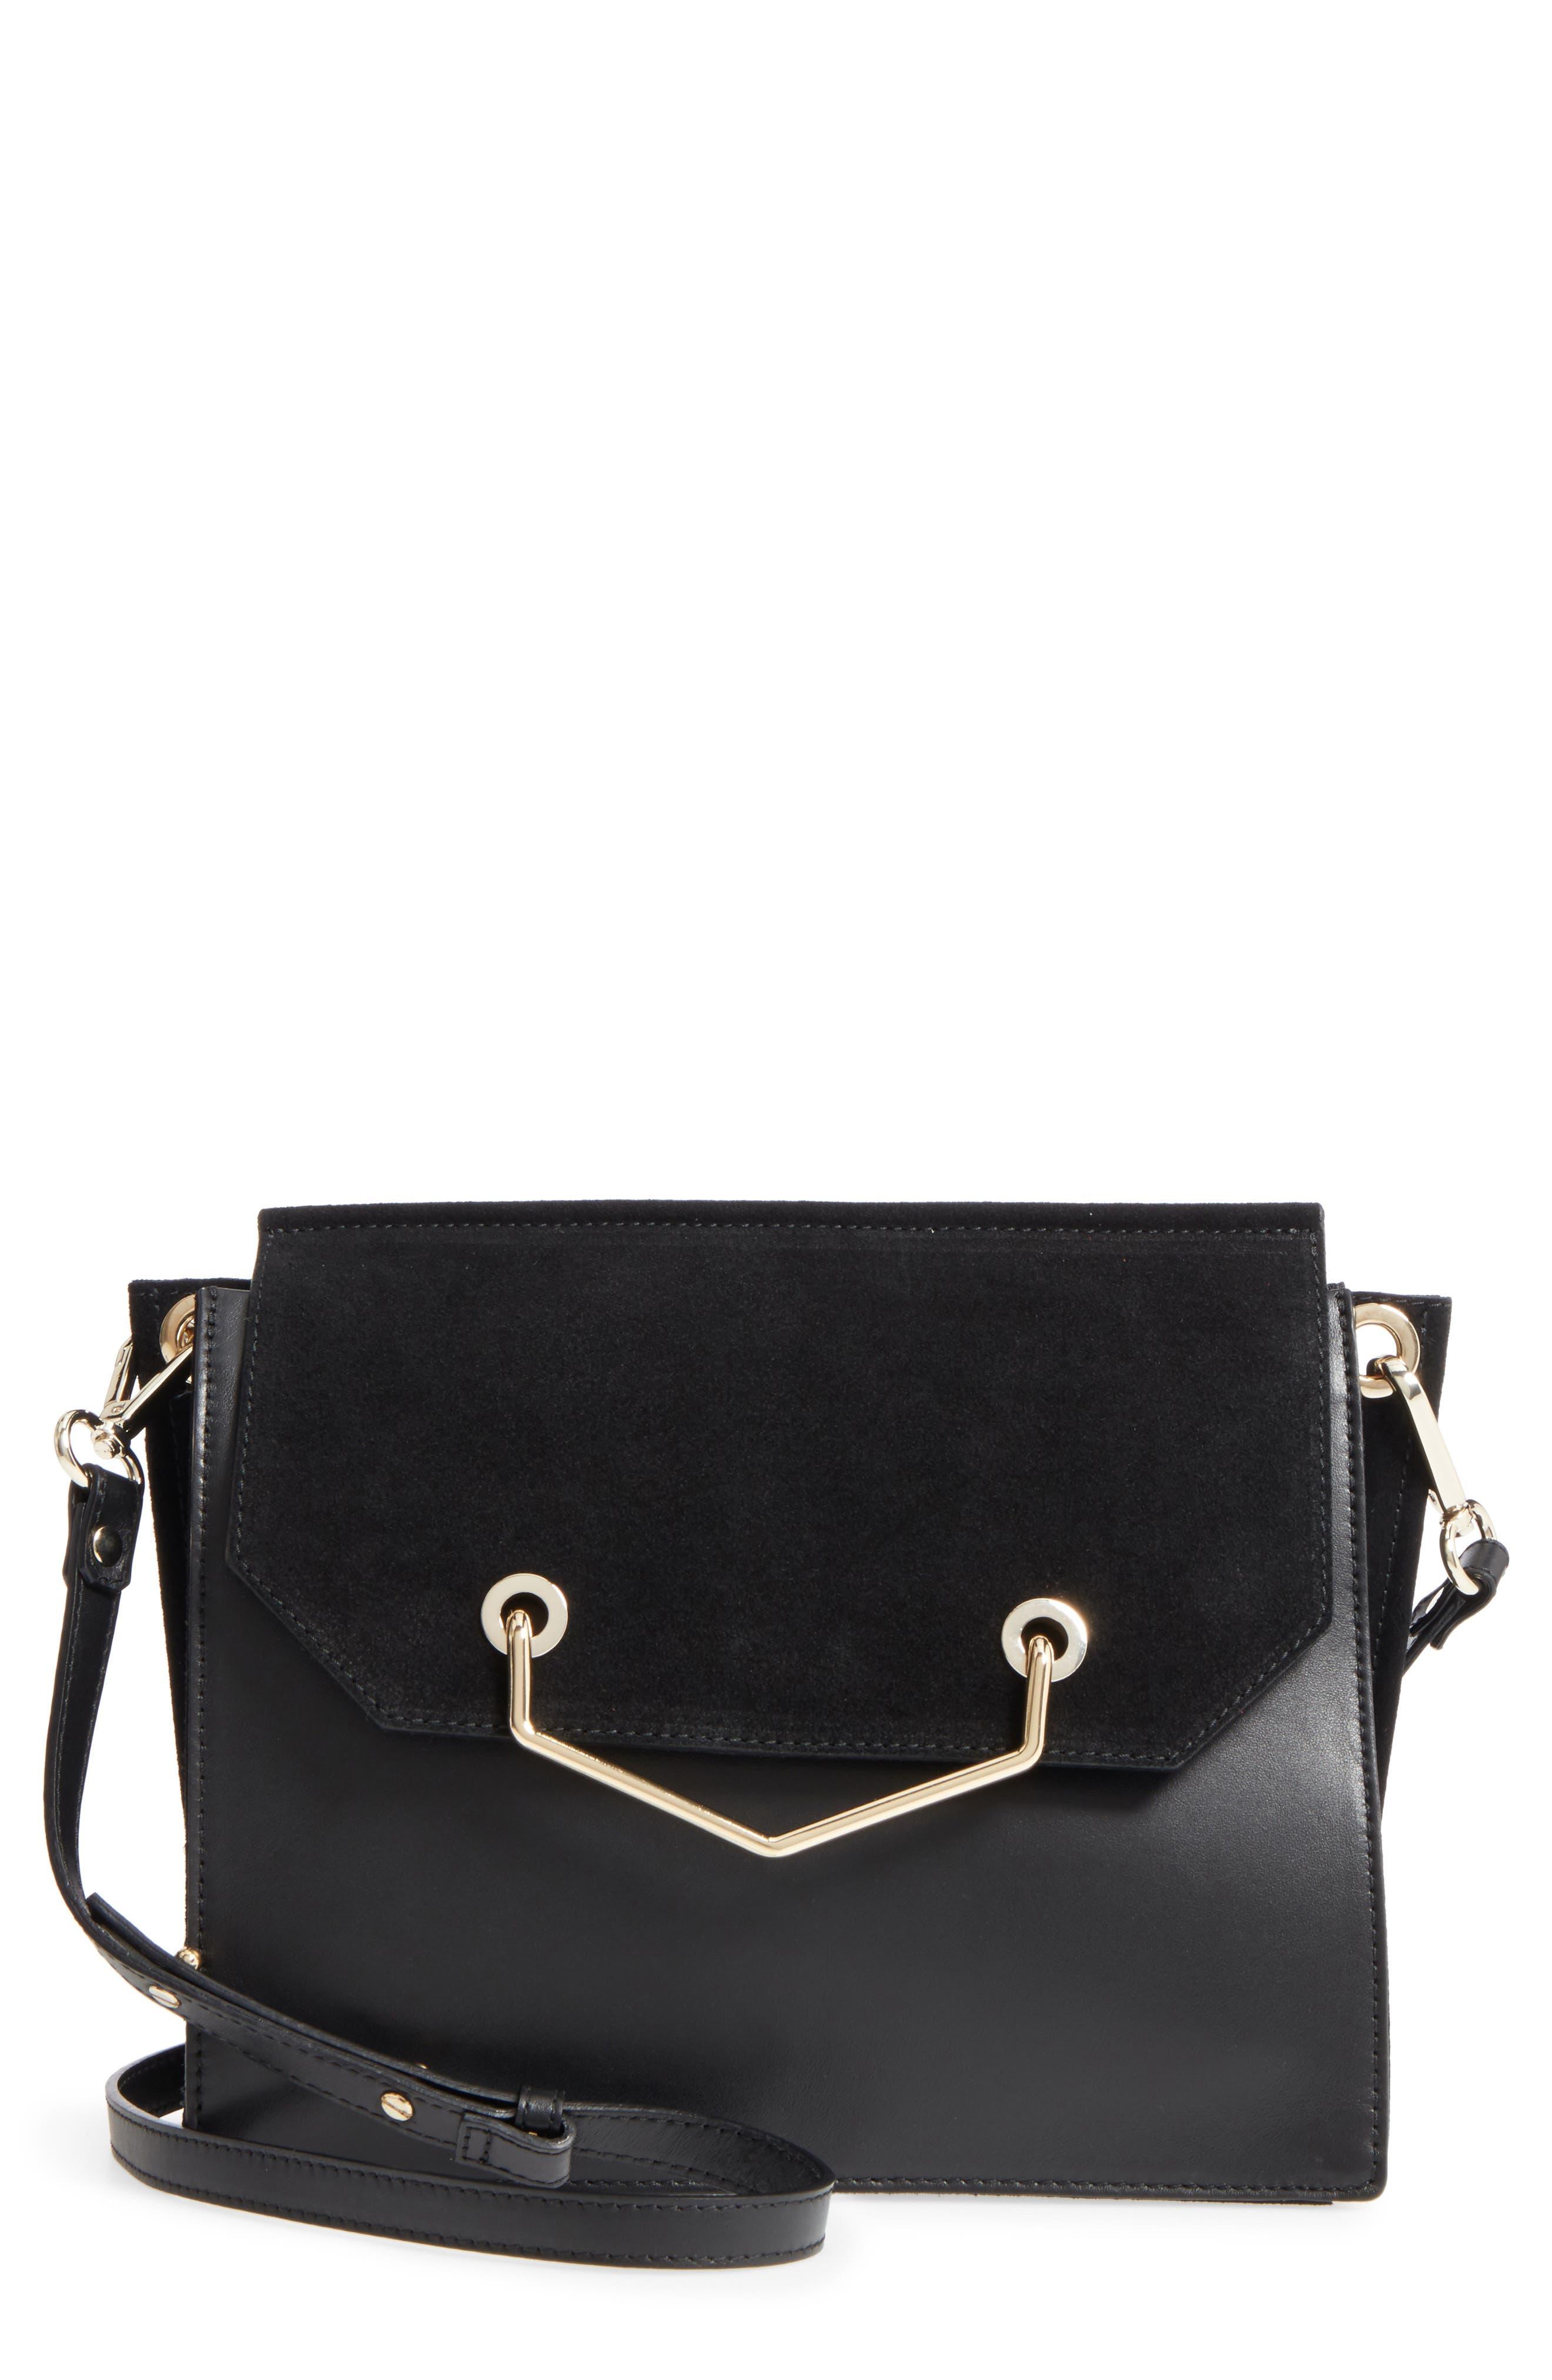 Premium Leather & Suede Soko Shoulder Bag,                             Main thumbnail 1, color,                             Black